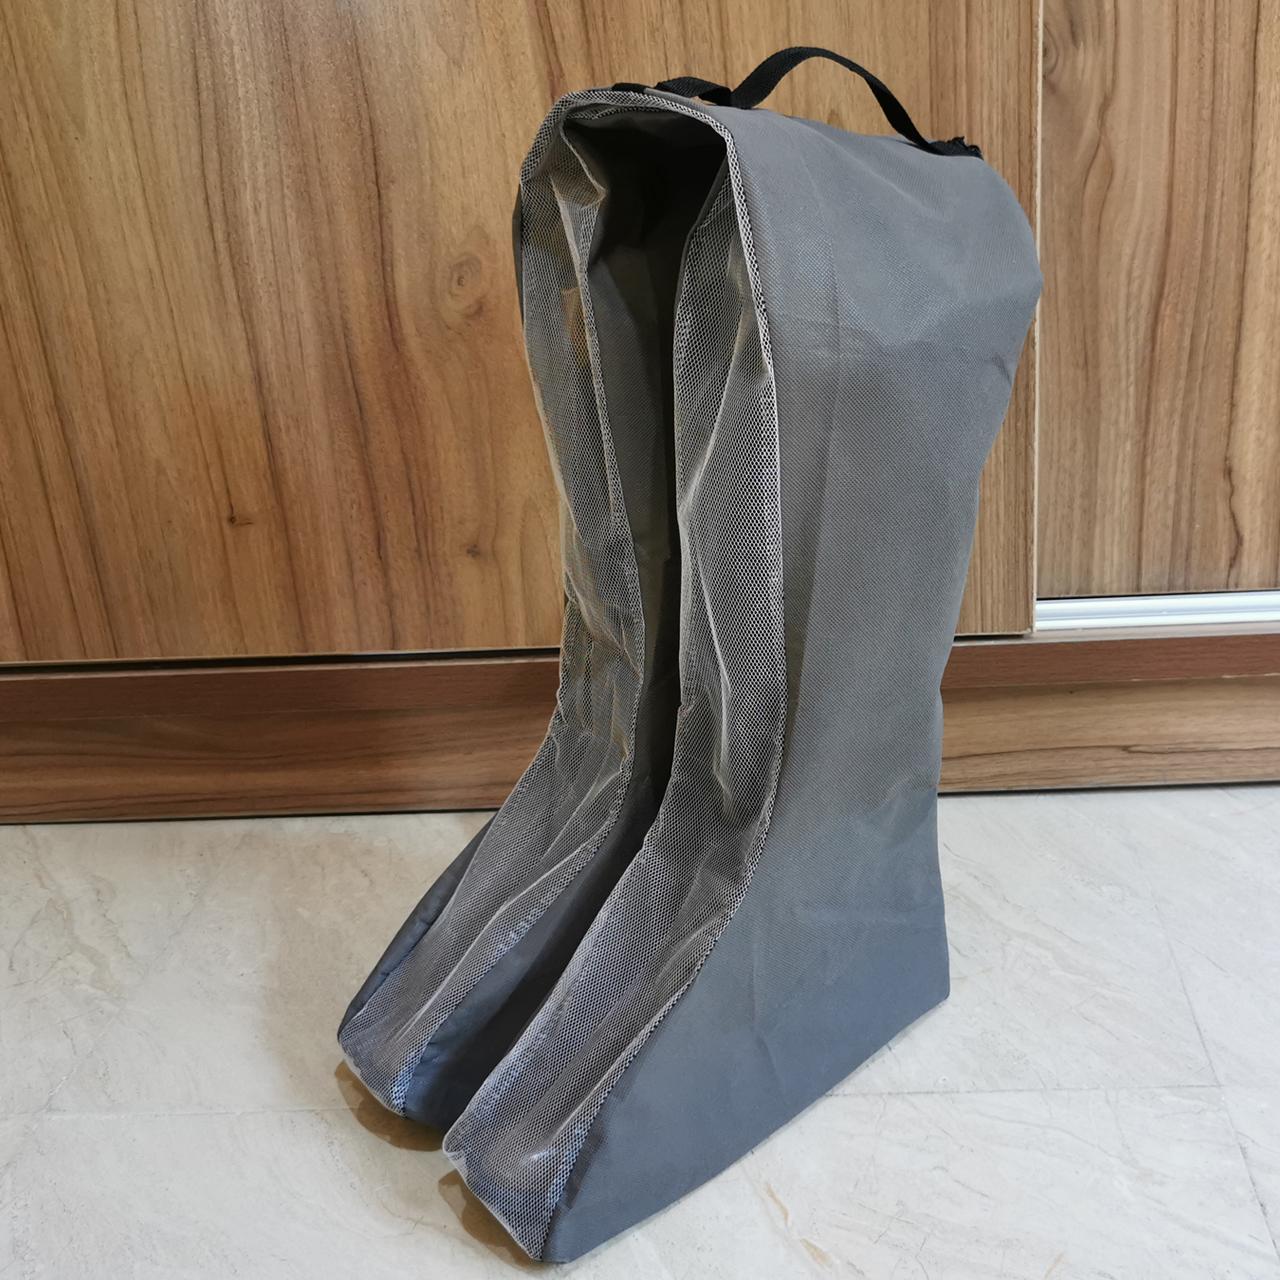 قیمت خرید کاور کفش پایا کد K21 مجموعه 4 عددی اورجینال